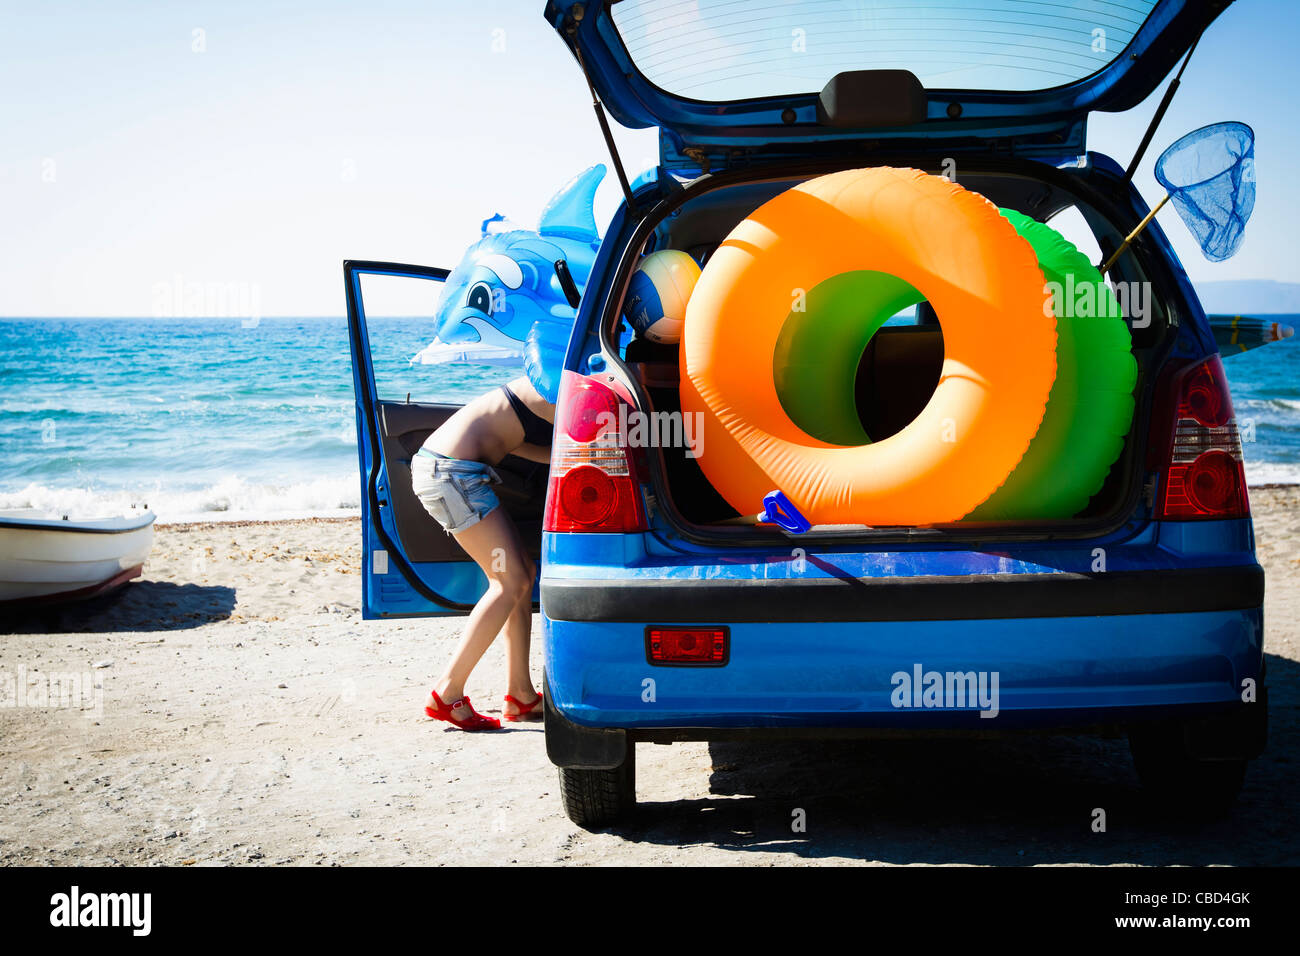 Frau entladen Strandspielzeug aus Auto Stockbild